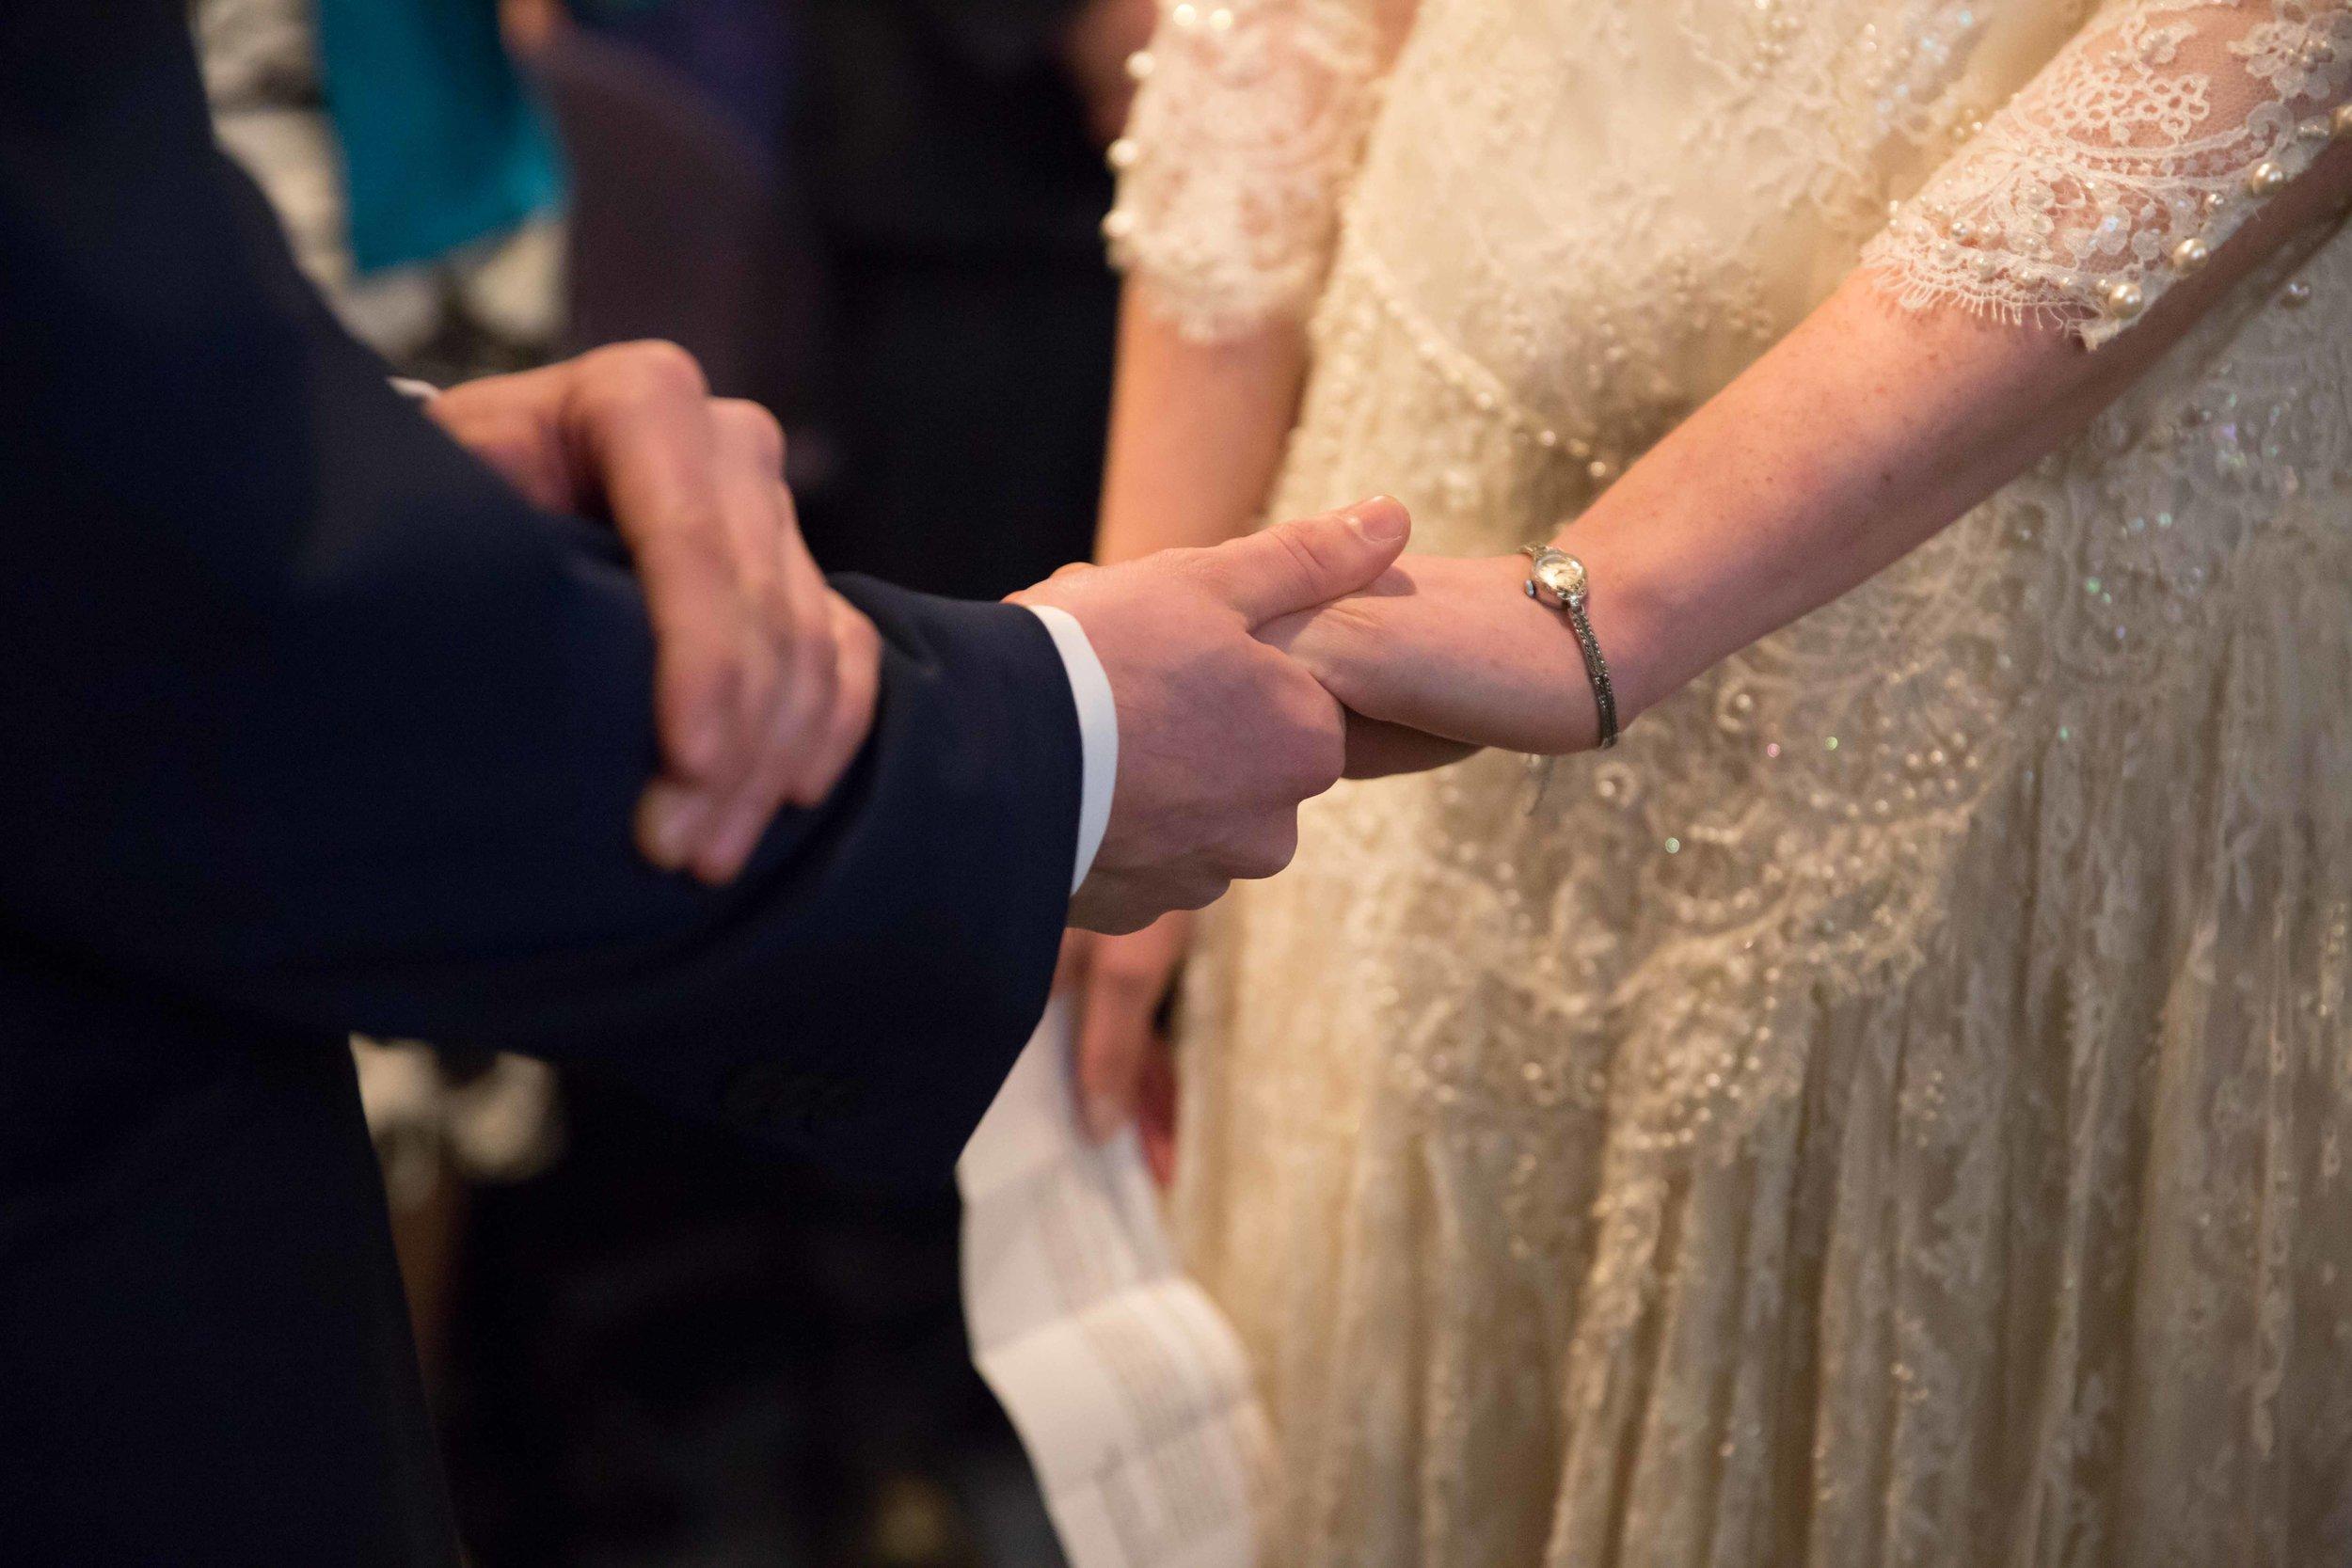 Adam & Faye - Wright Wedding Photography - Bristol Wedding Photographer -111.jpg